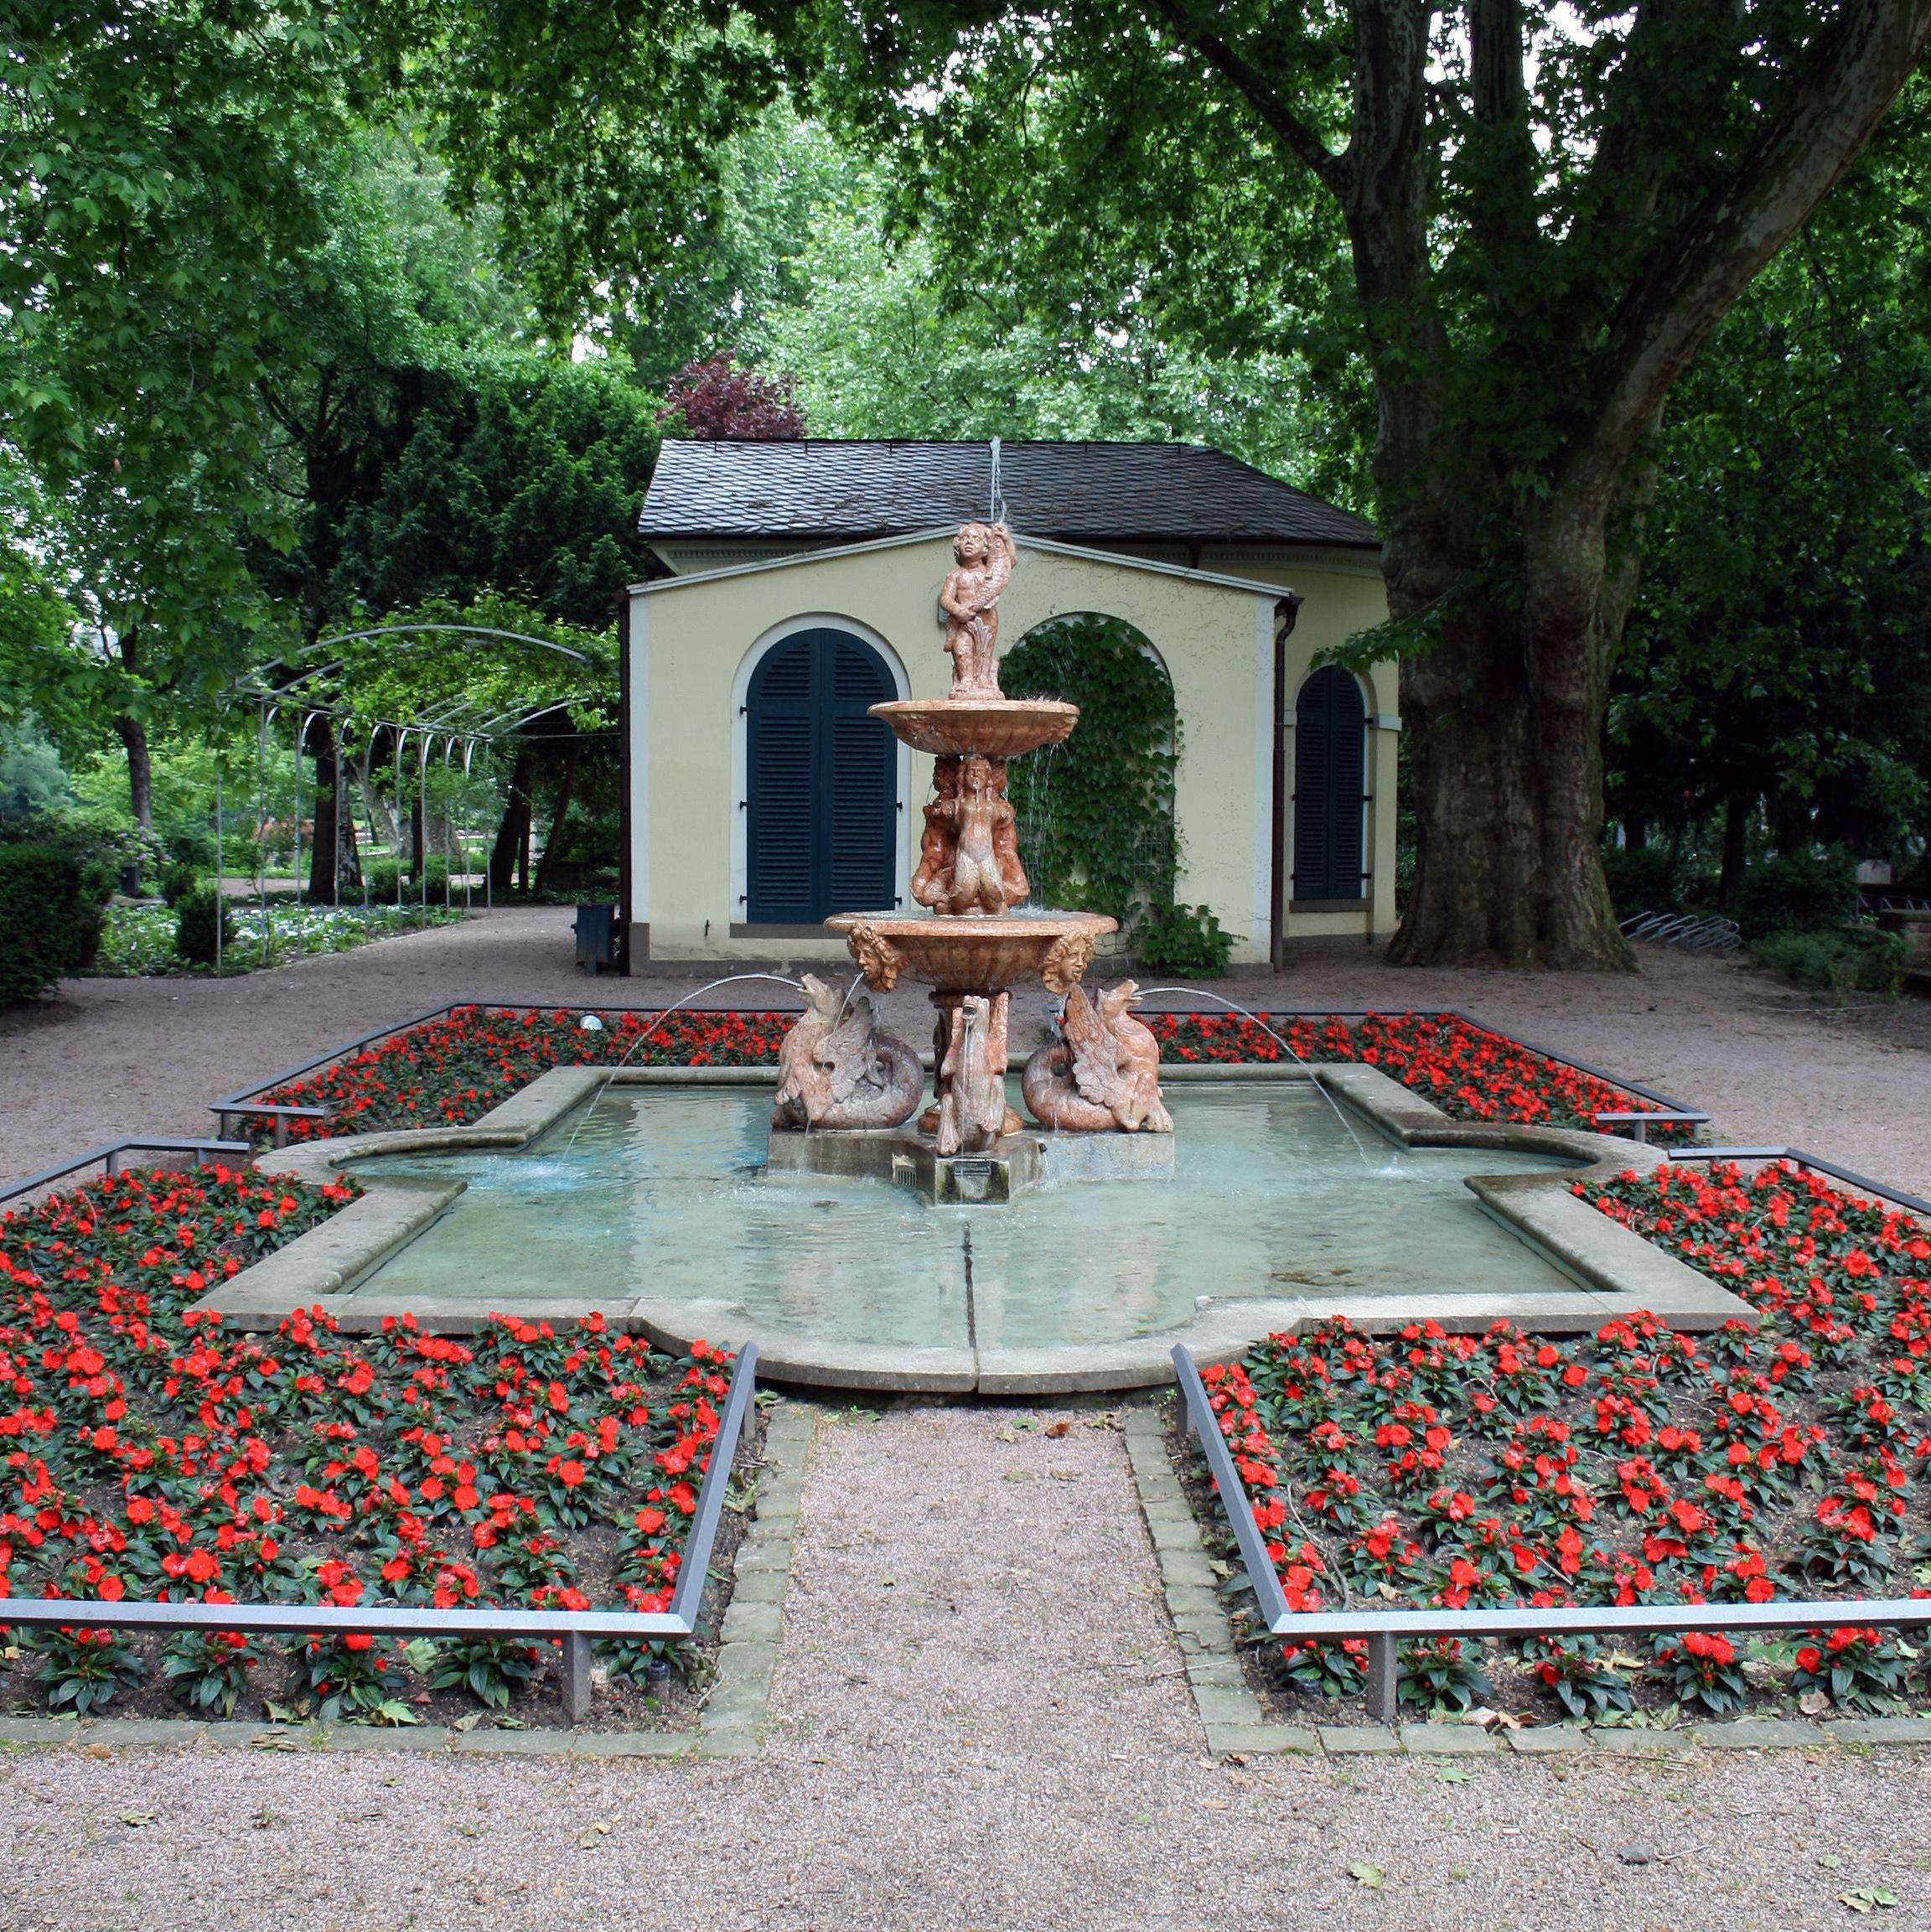 File:Nebbiensches Gartenhaus side1.   Wikimedia Commons